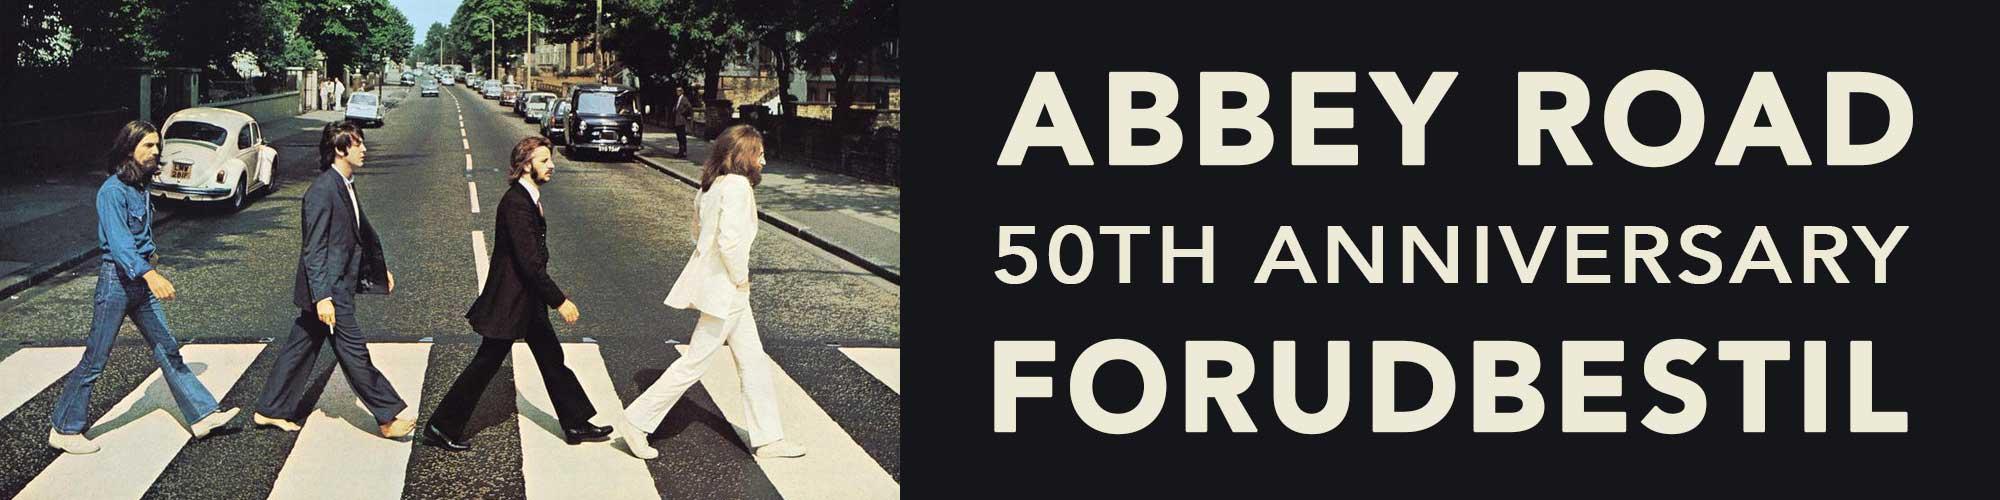 Forudbestil Abbey Road nu!